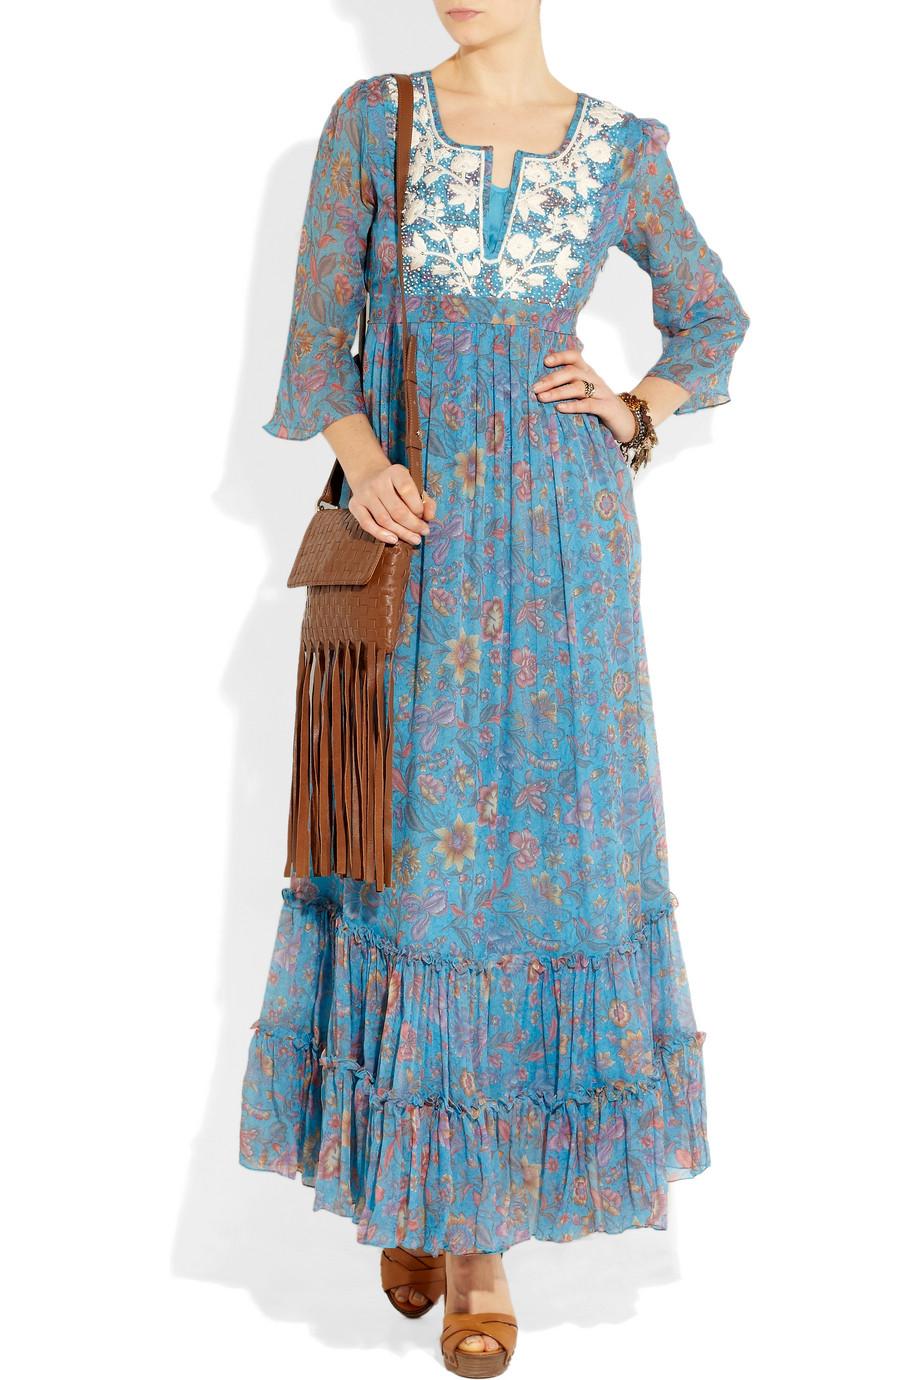 chiffon Floral dress silk